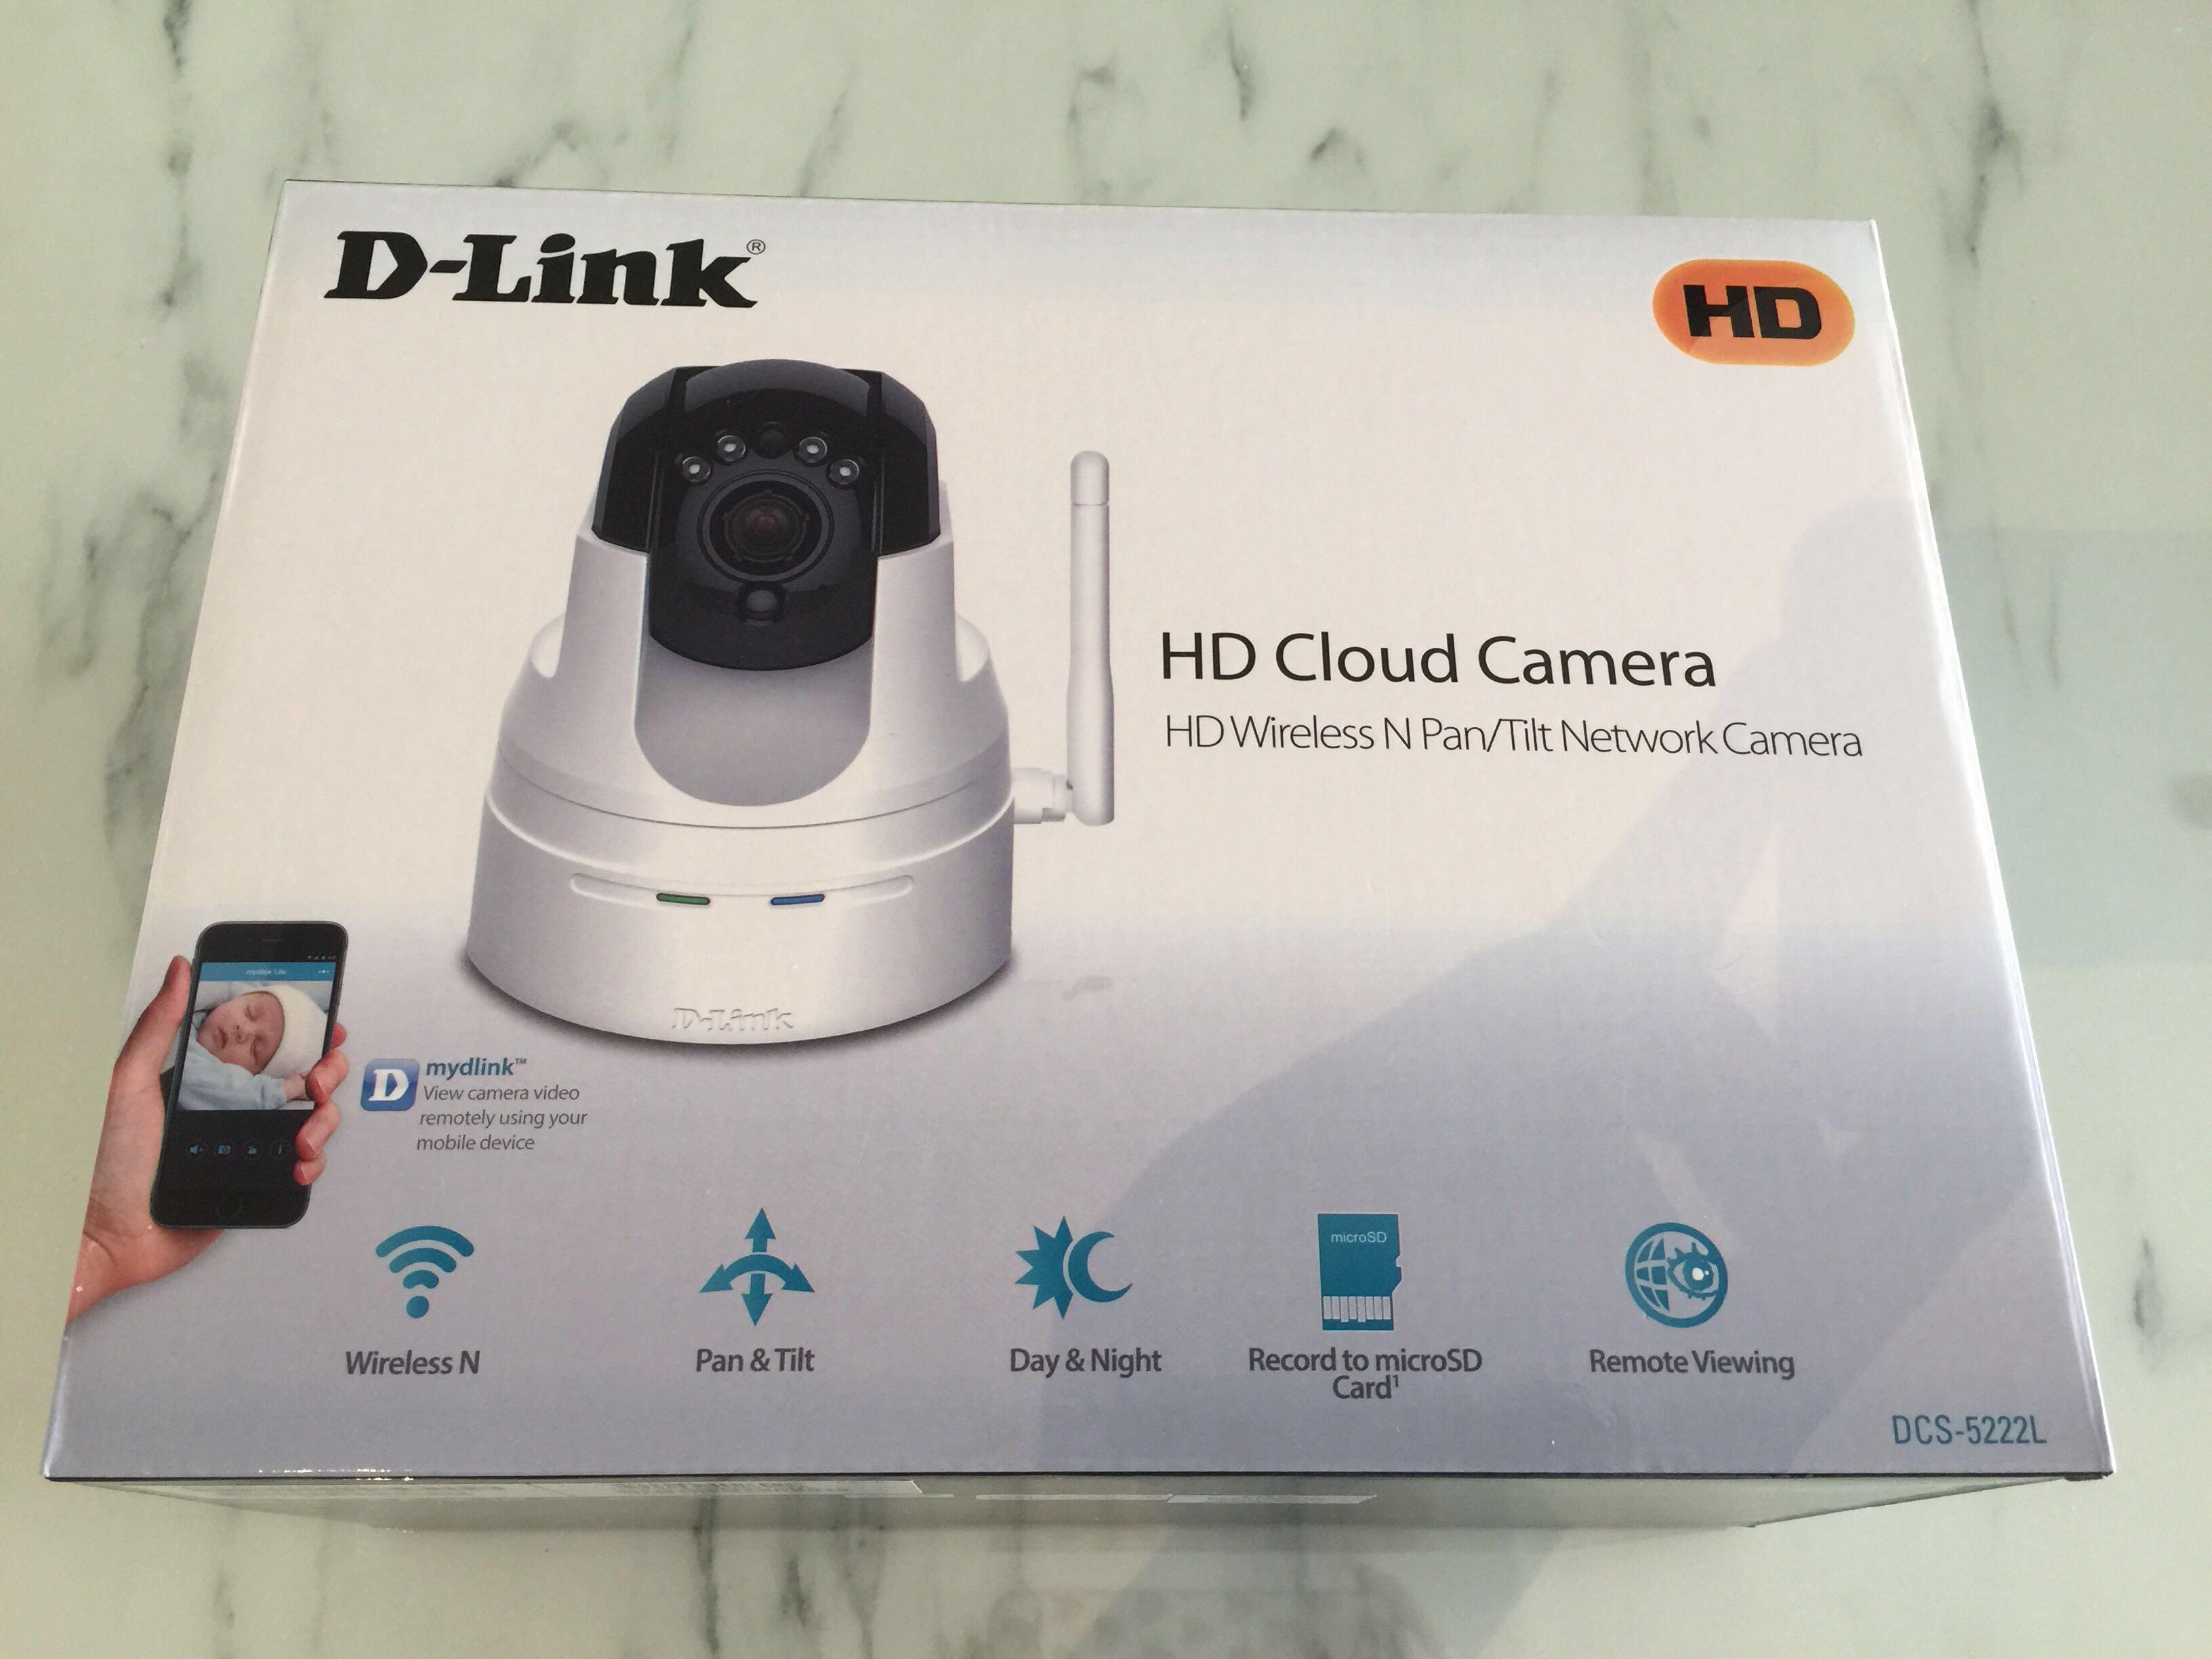 D-Link DCS-5222L HD Cloud Camera IPCamera on Carousell